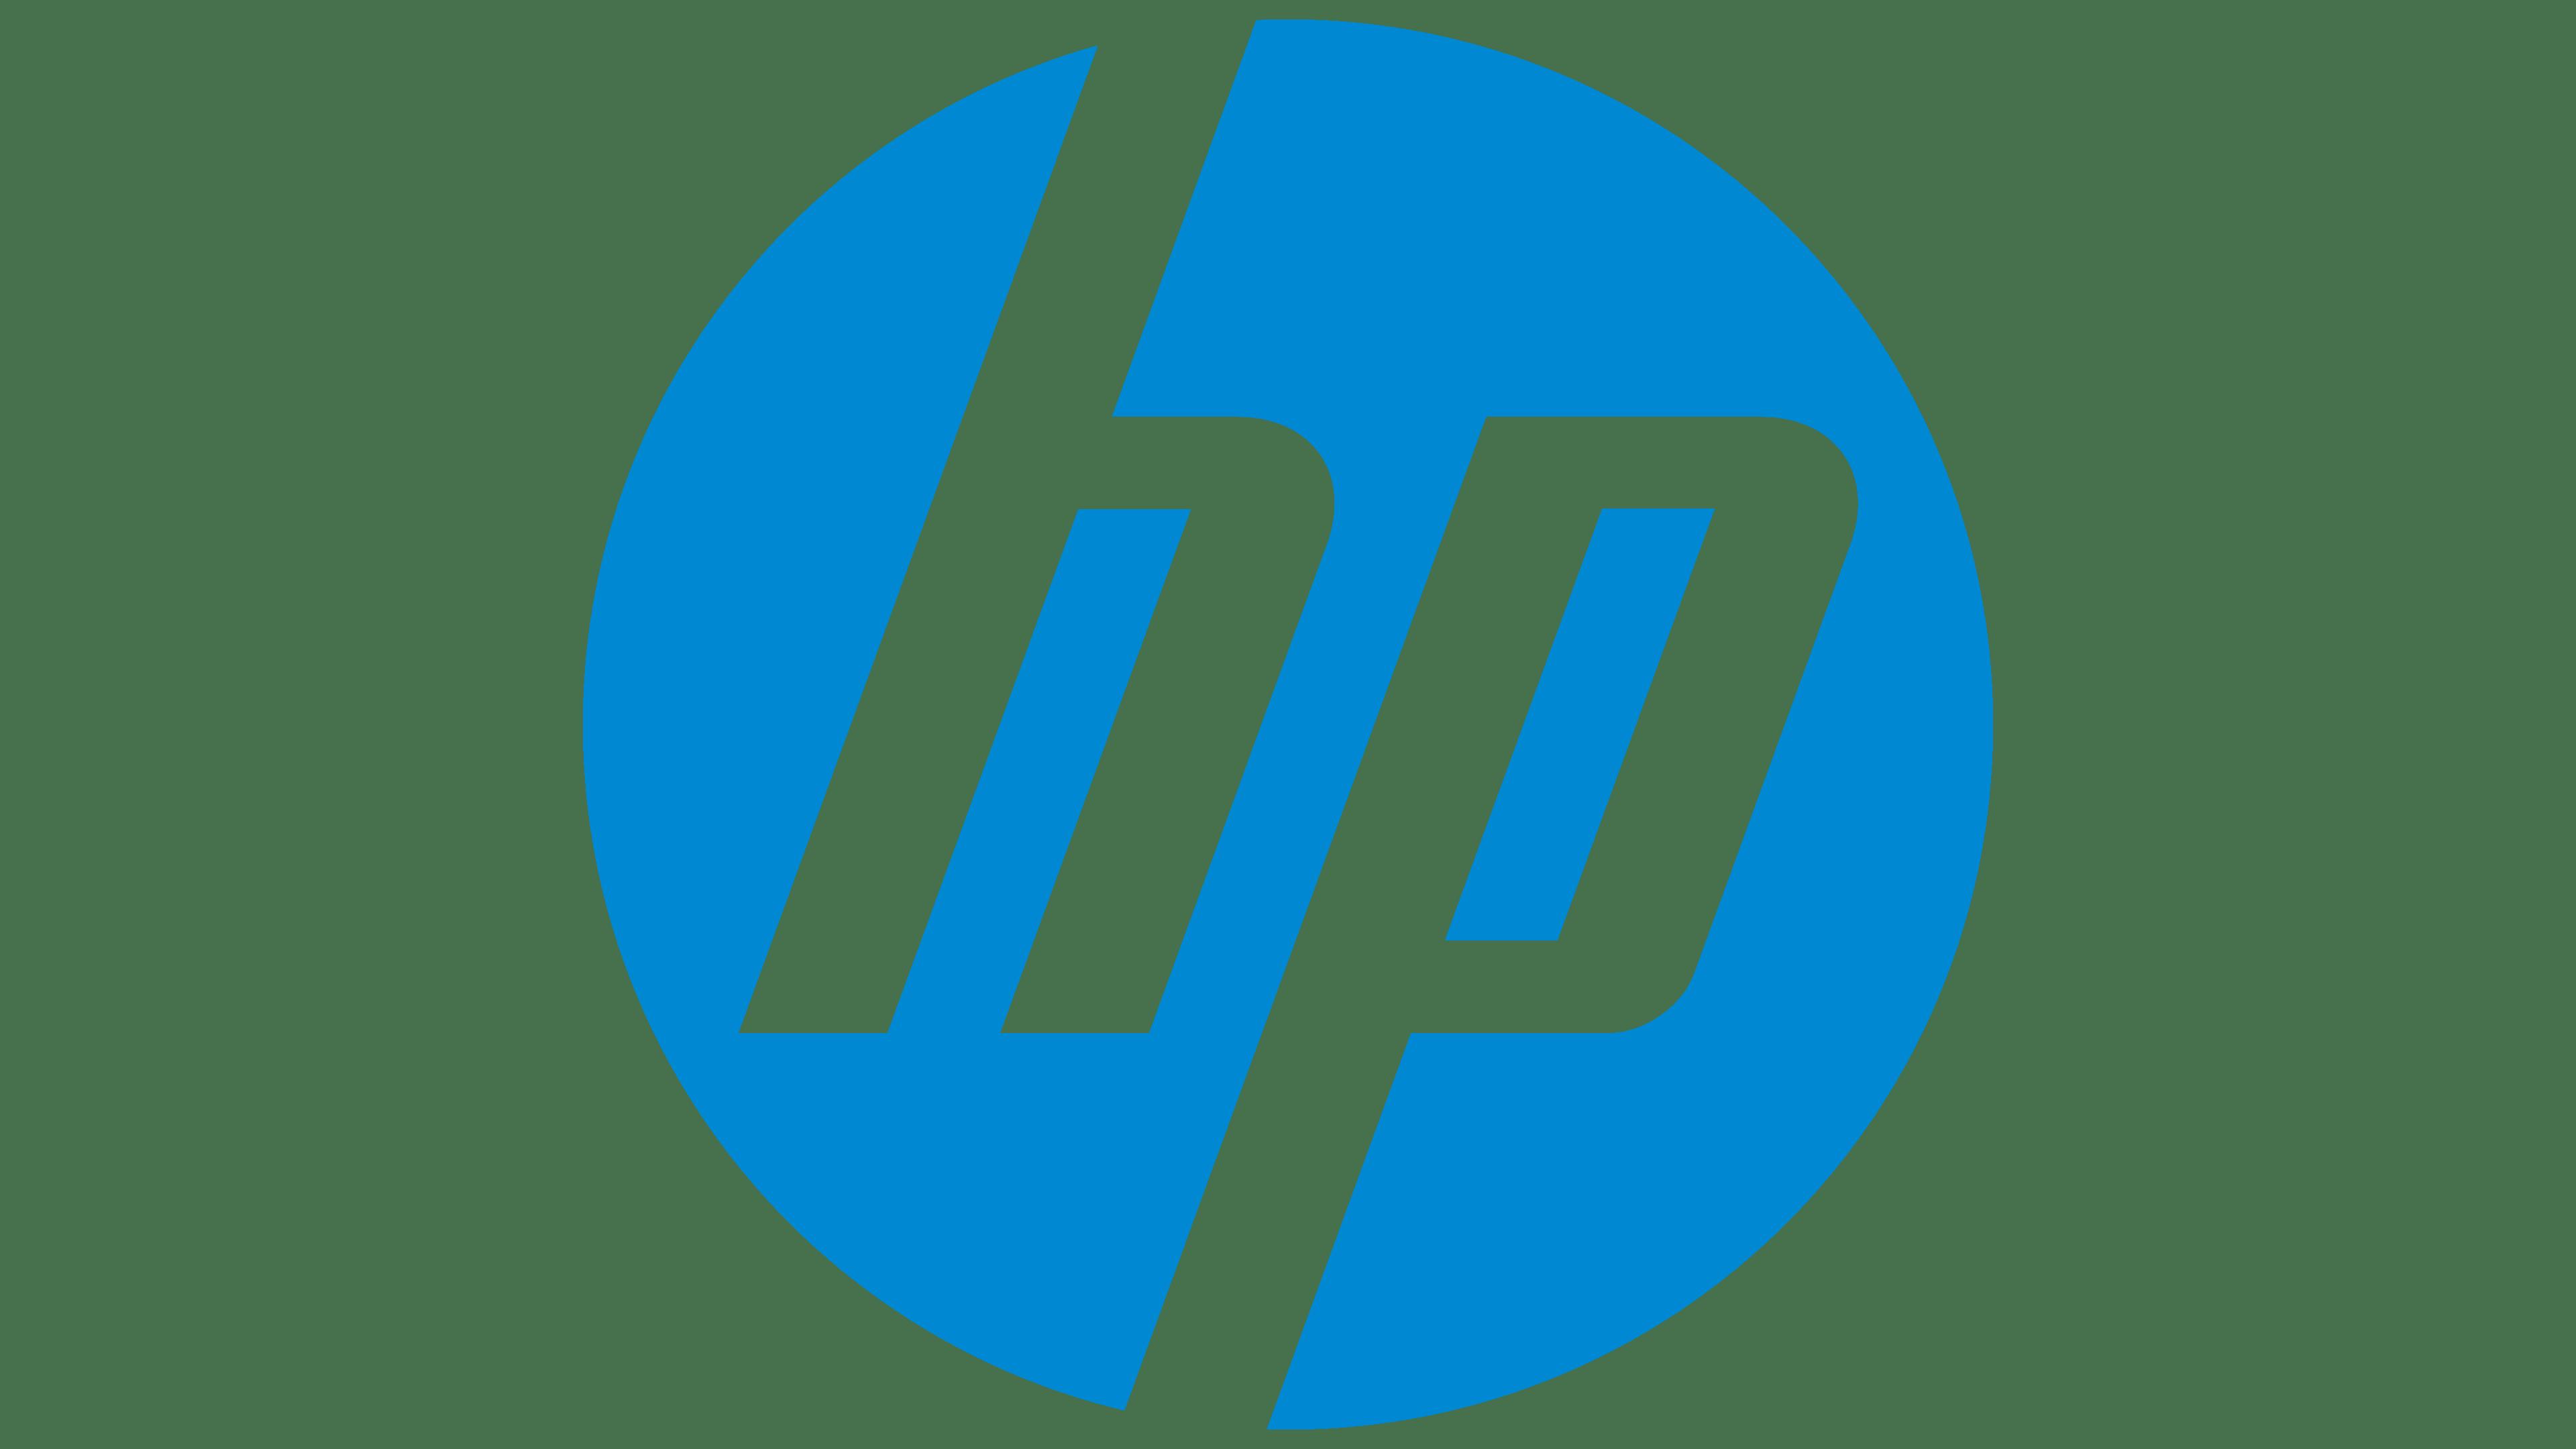 HP-Logo-alternance-euridis-ecole-de-commerce-business-developer